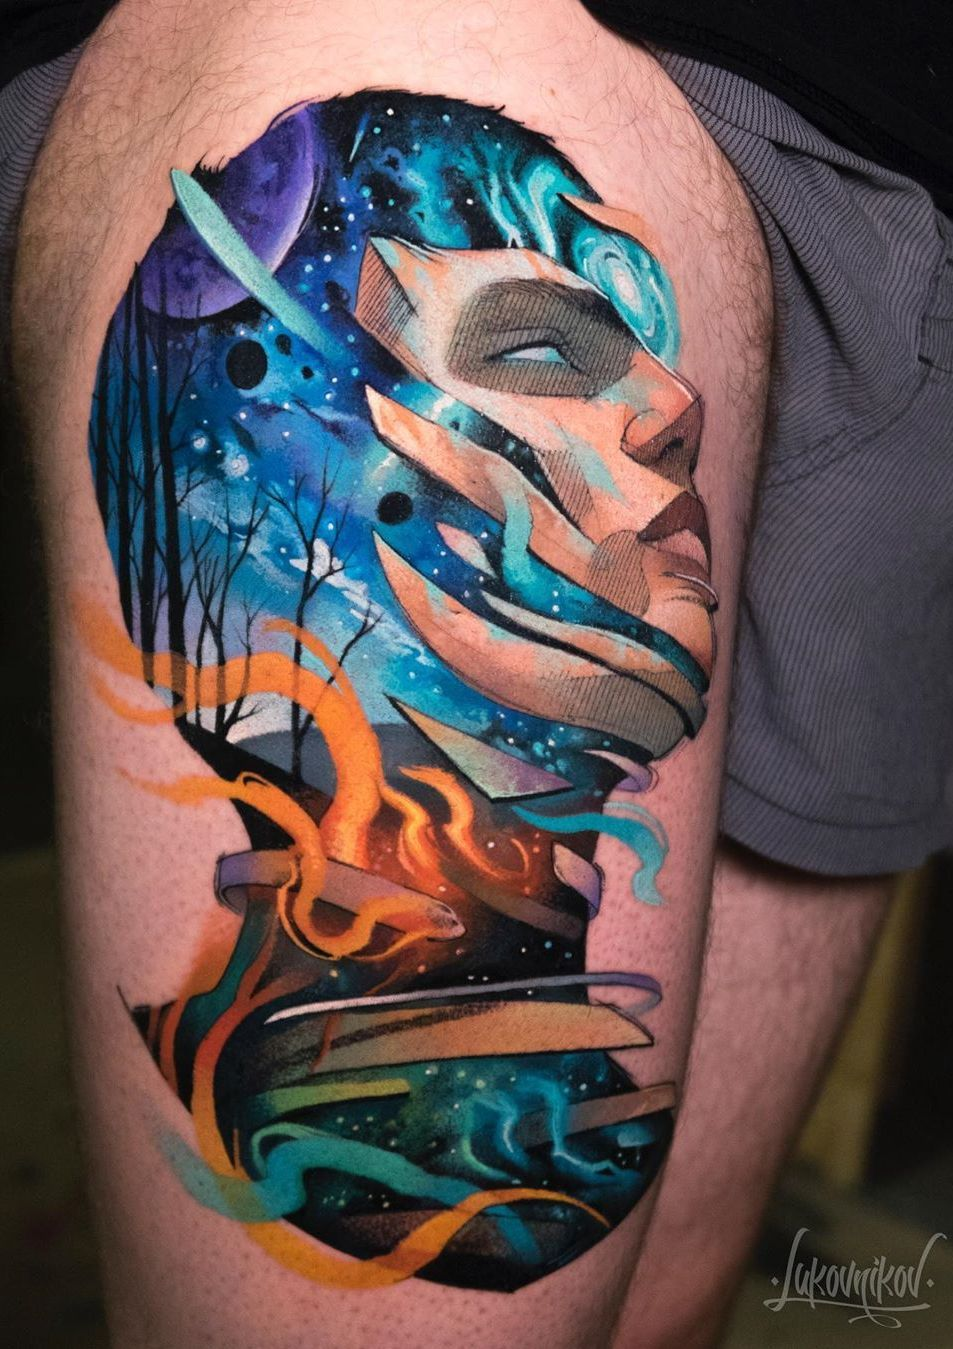 Beautiful surrealist doubleexposure tattoos mash up